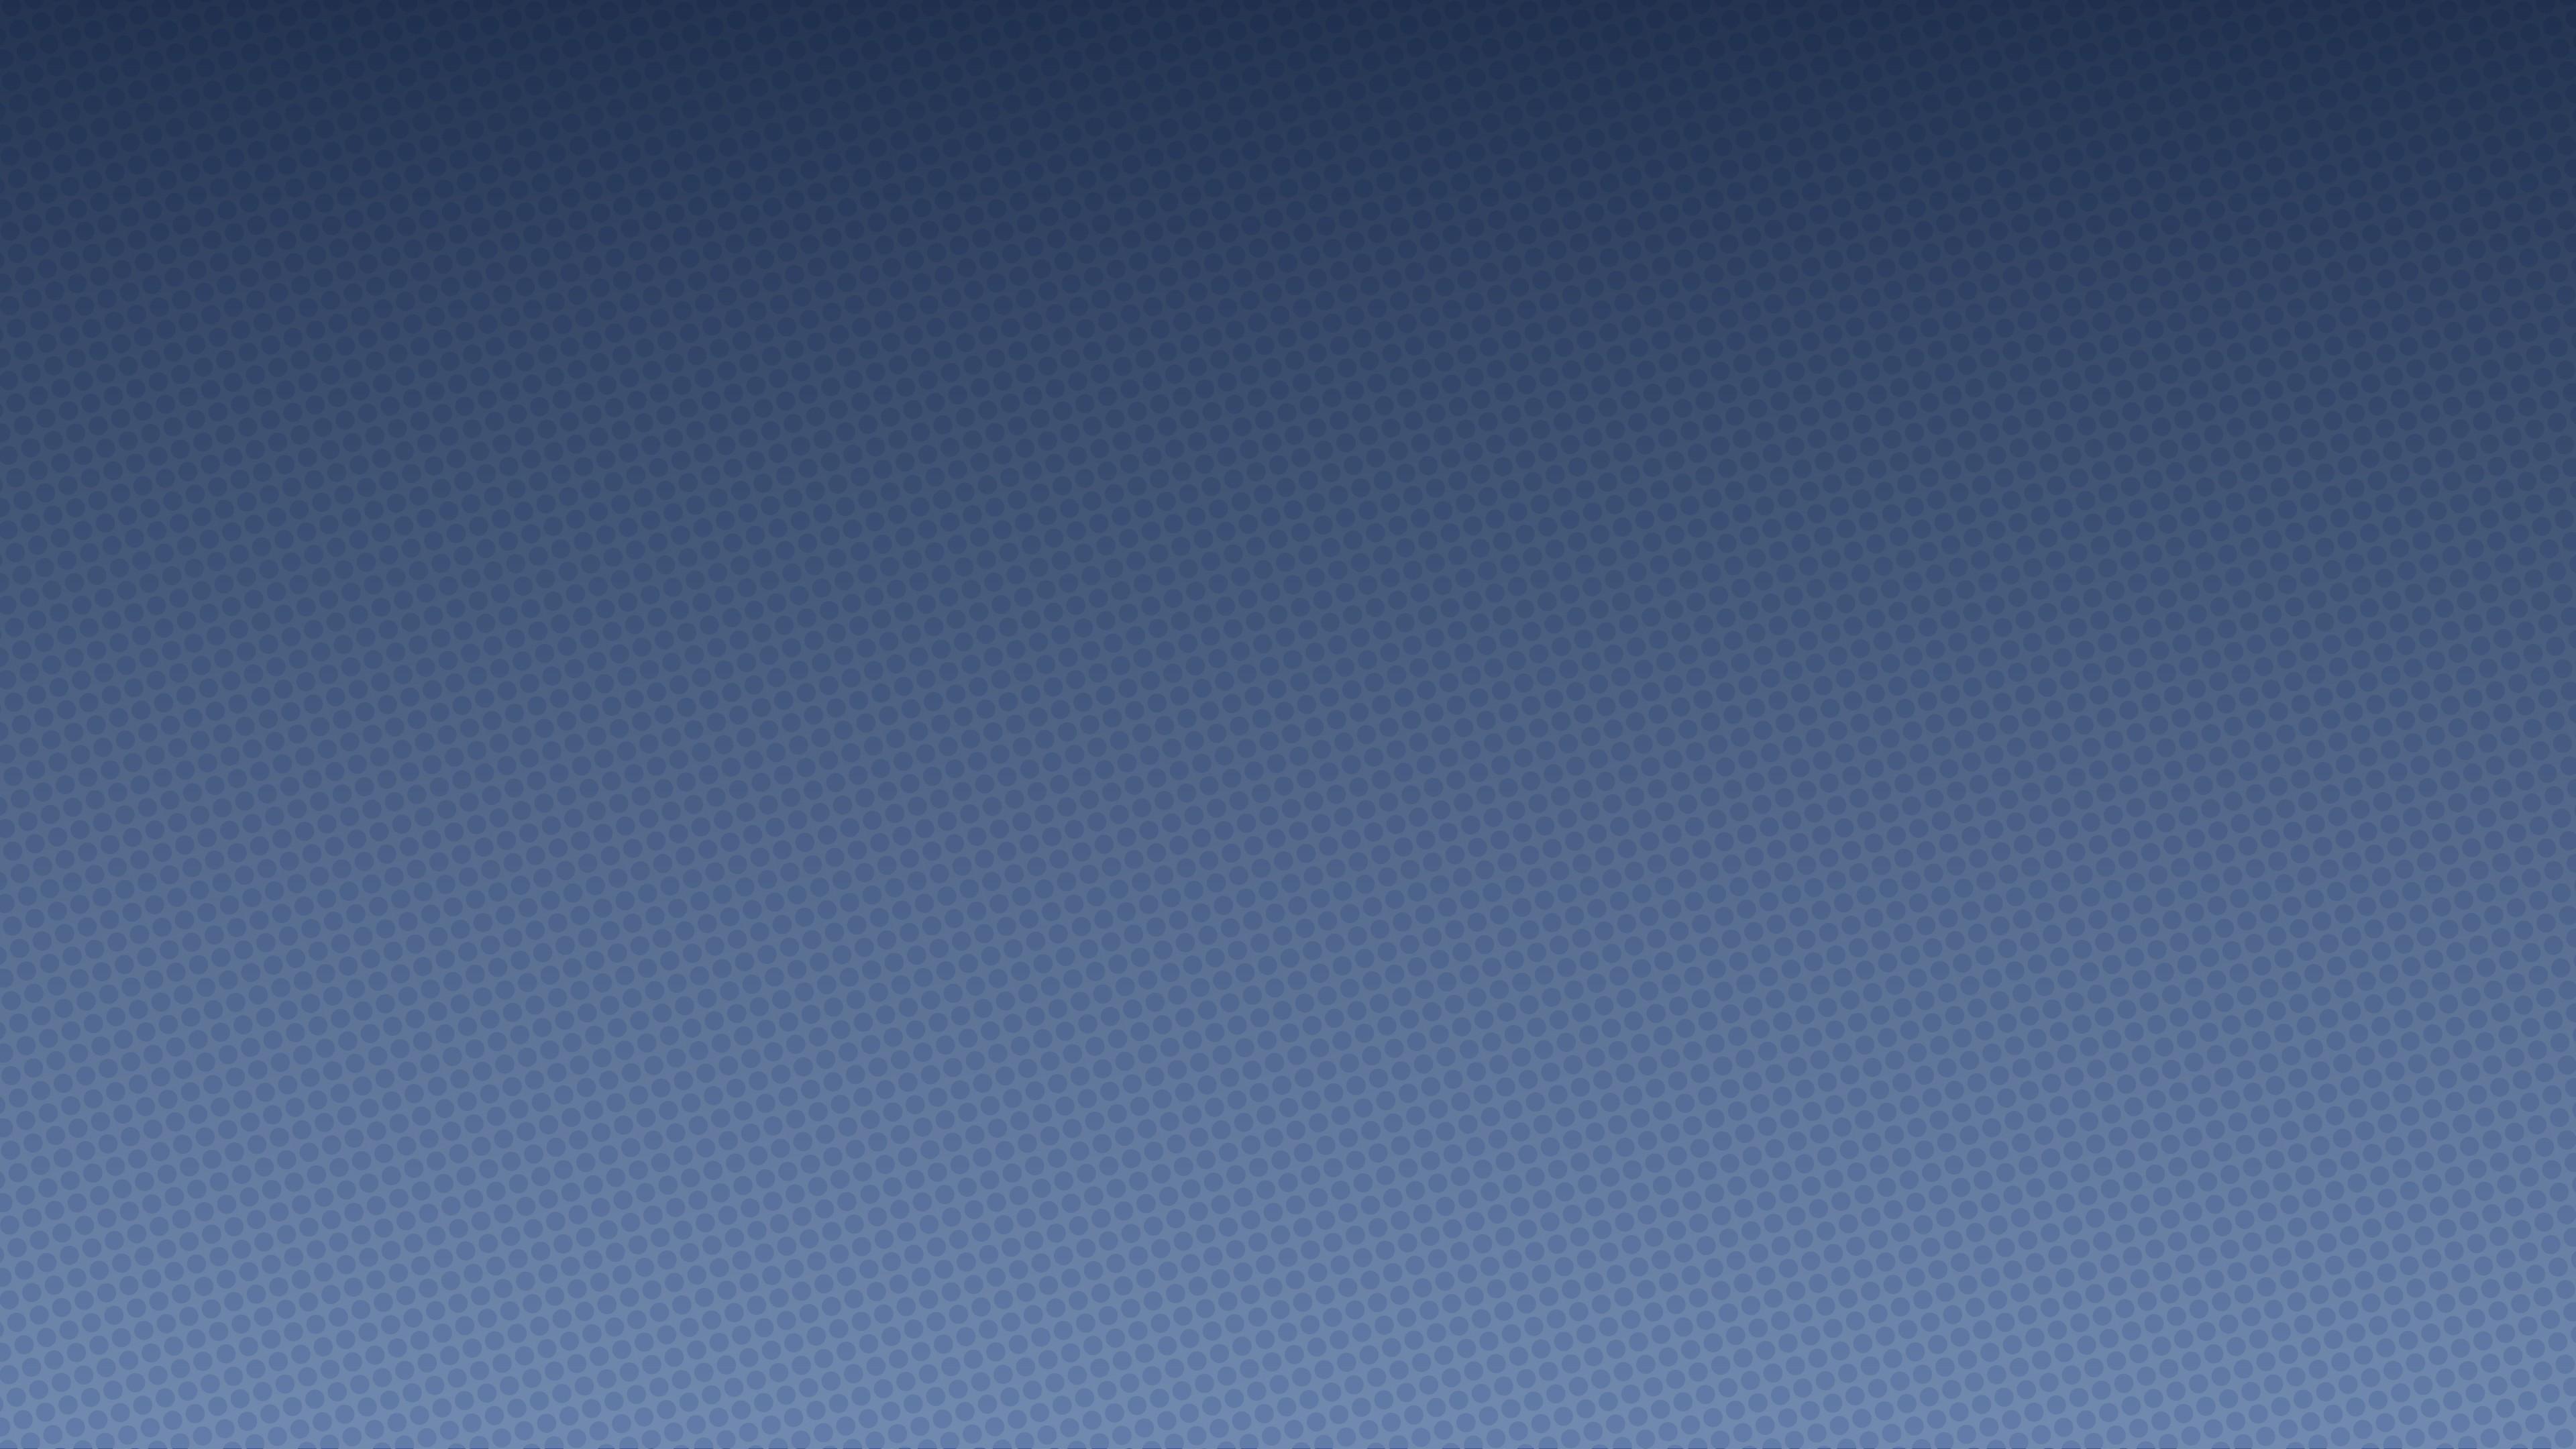 General 3840x2160 polka dots gradient soft gradient  simple simple background Game Grumps Steam Train